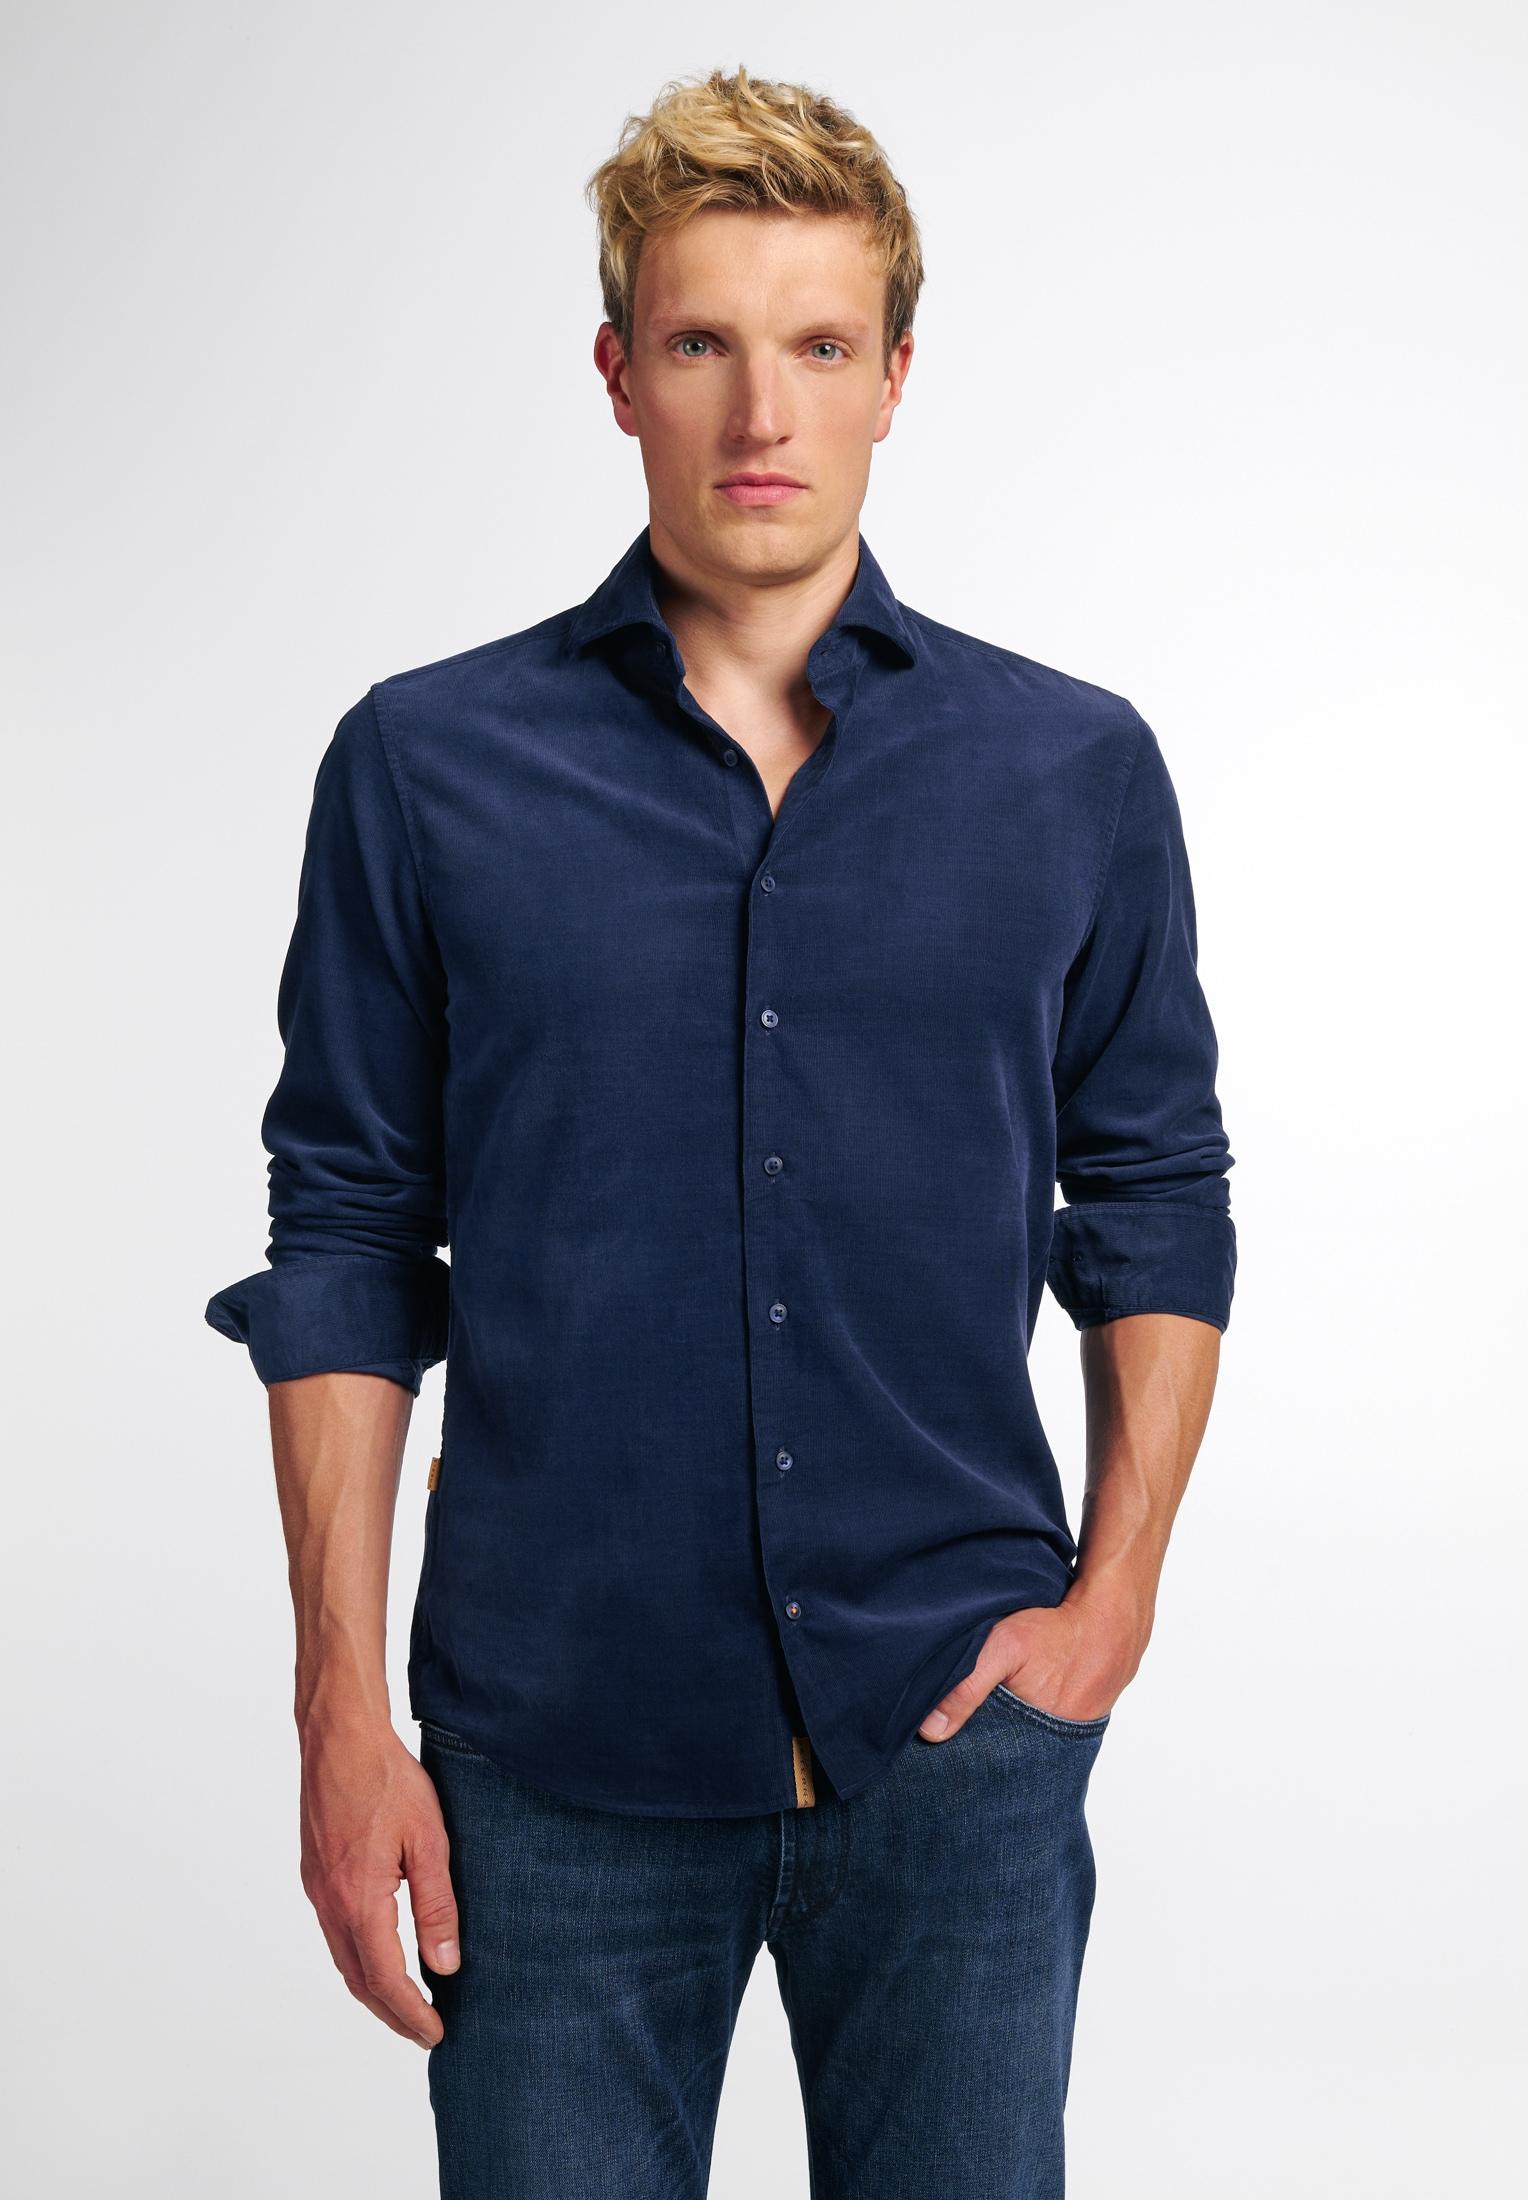 Eterna Businesshemd SLIM FIT, Langarm blau Herren Business Hemden Businessmode